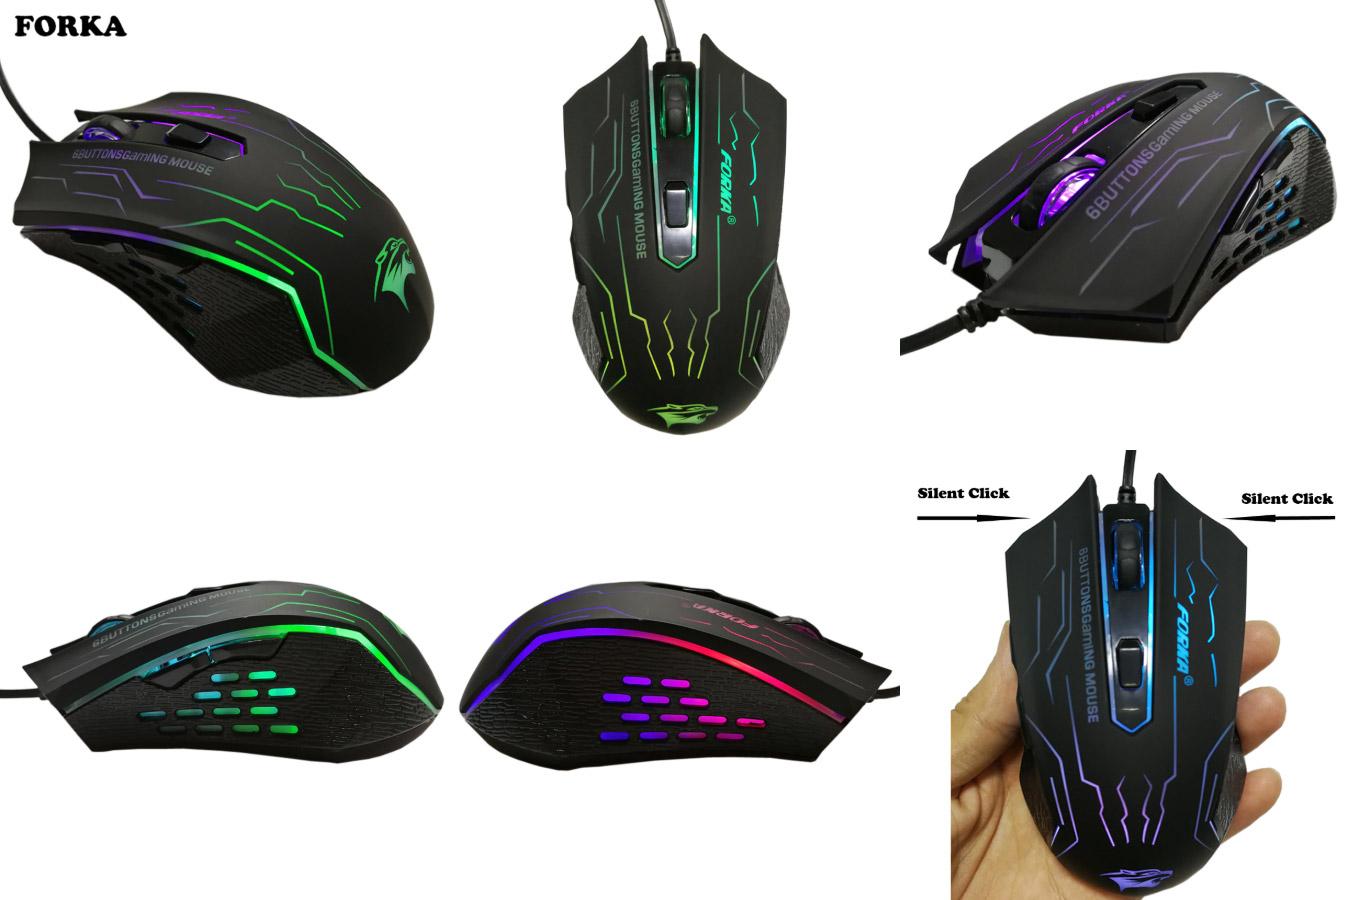 Качественная мышка с алиэкспресс FORKA LQS Gaming Mouse